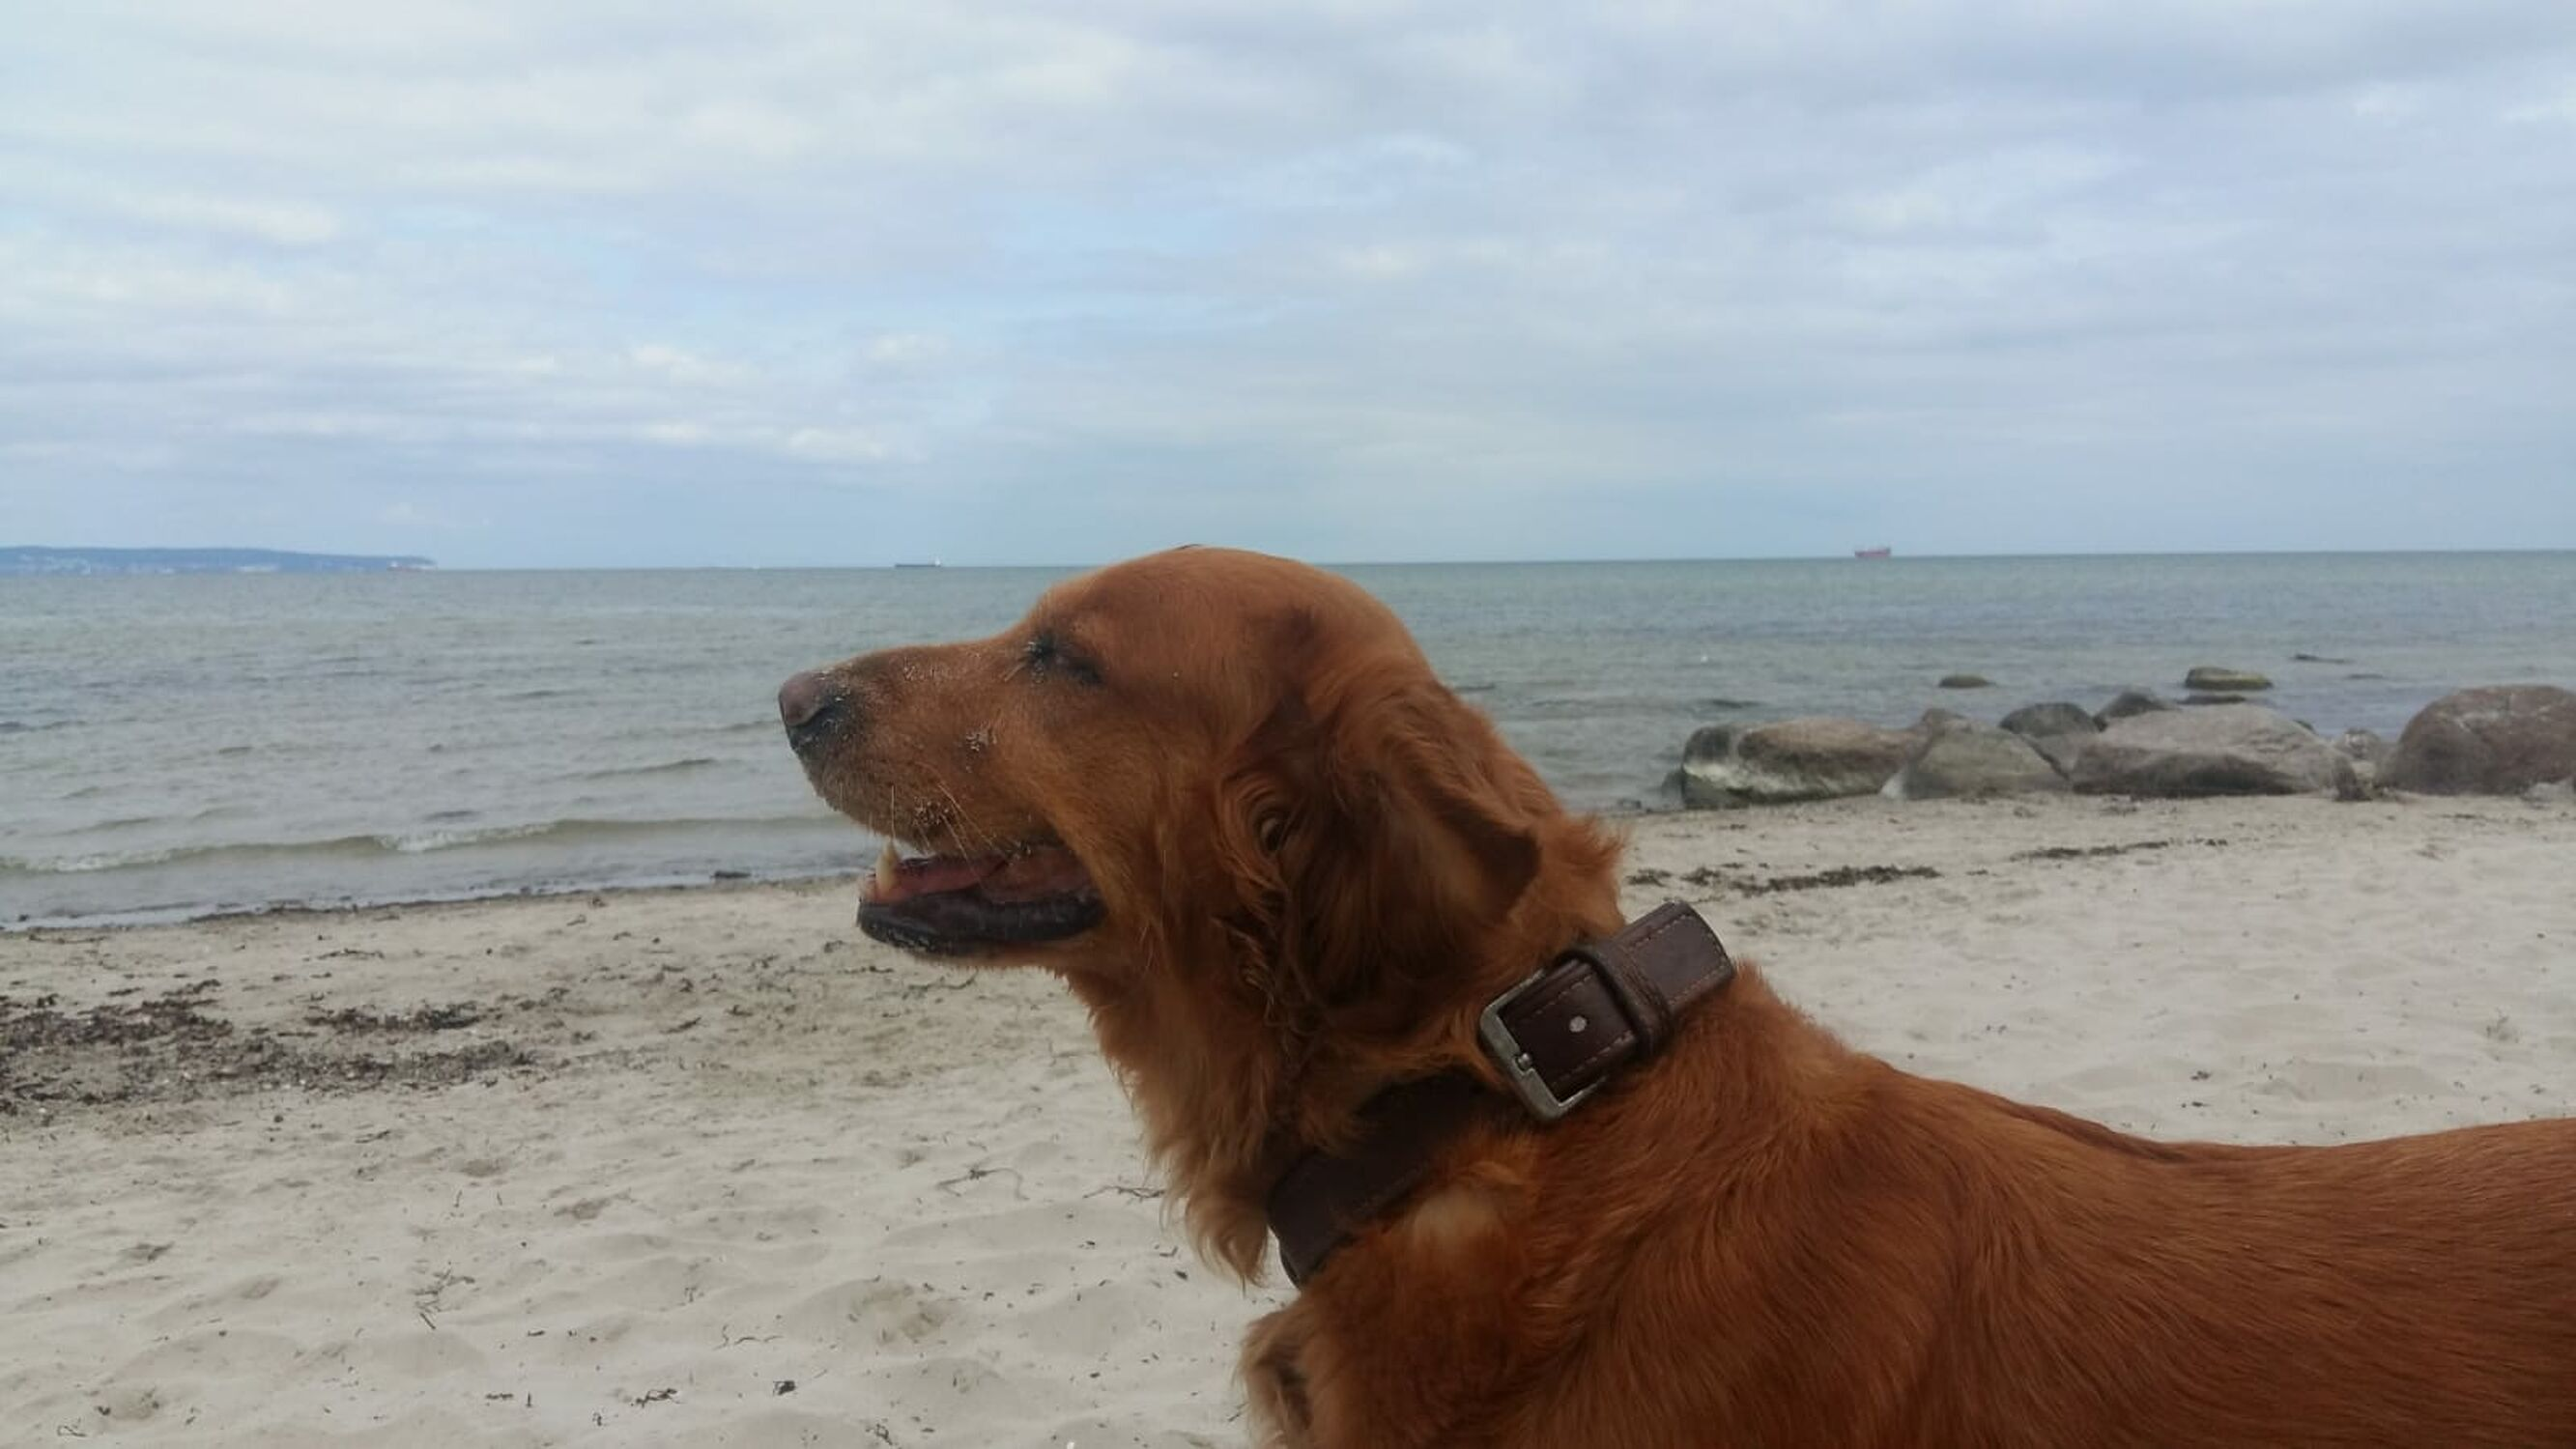 Bild mit Strand, Hund, Rassehunden, Nordsee, Küste, Hundestrand